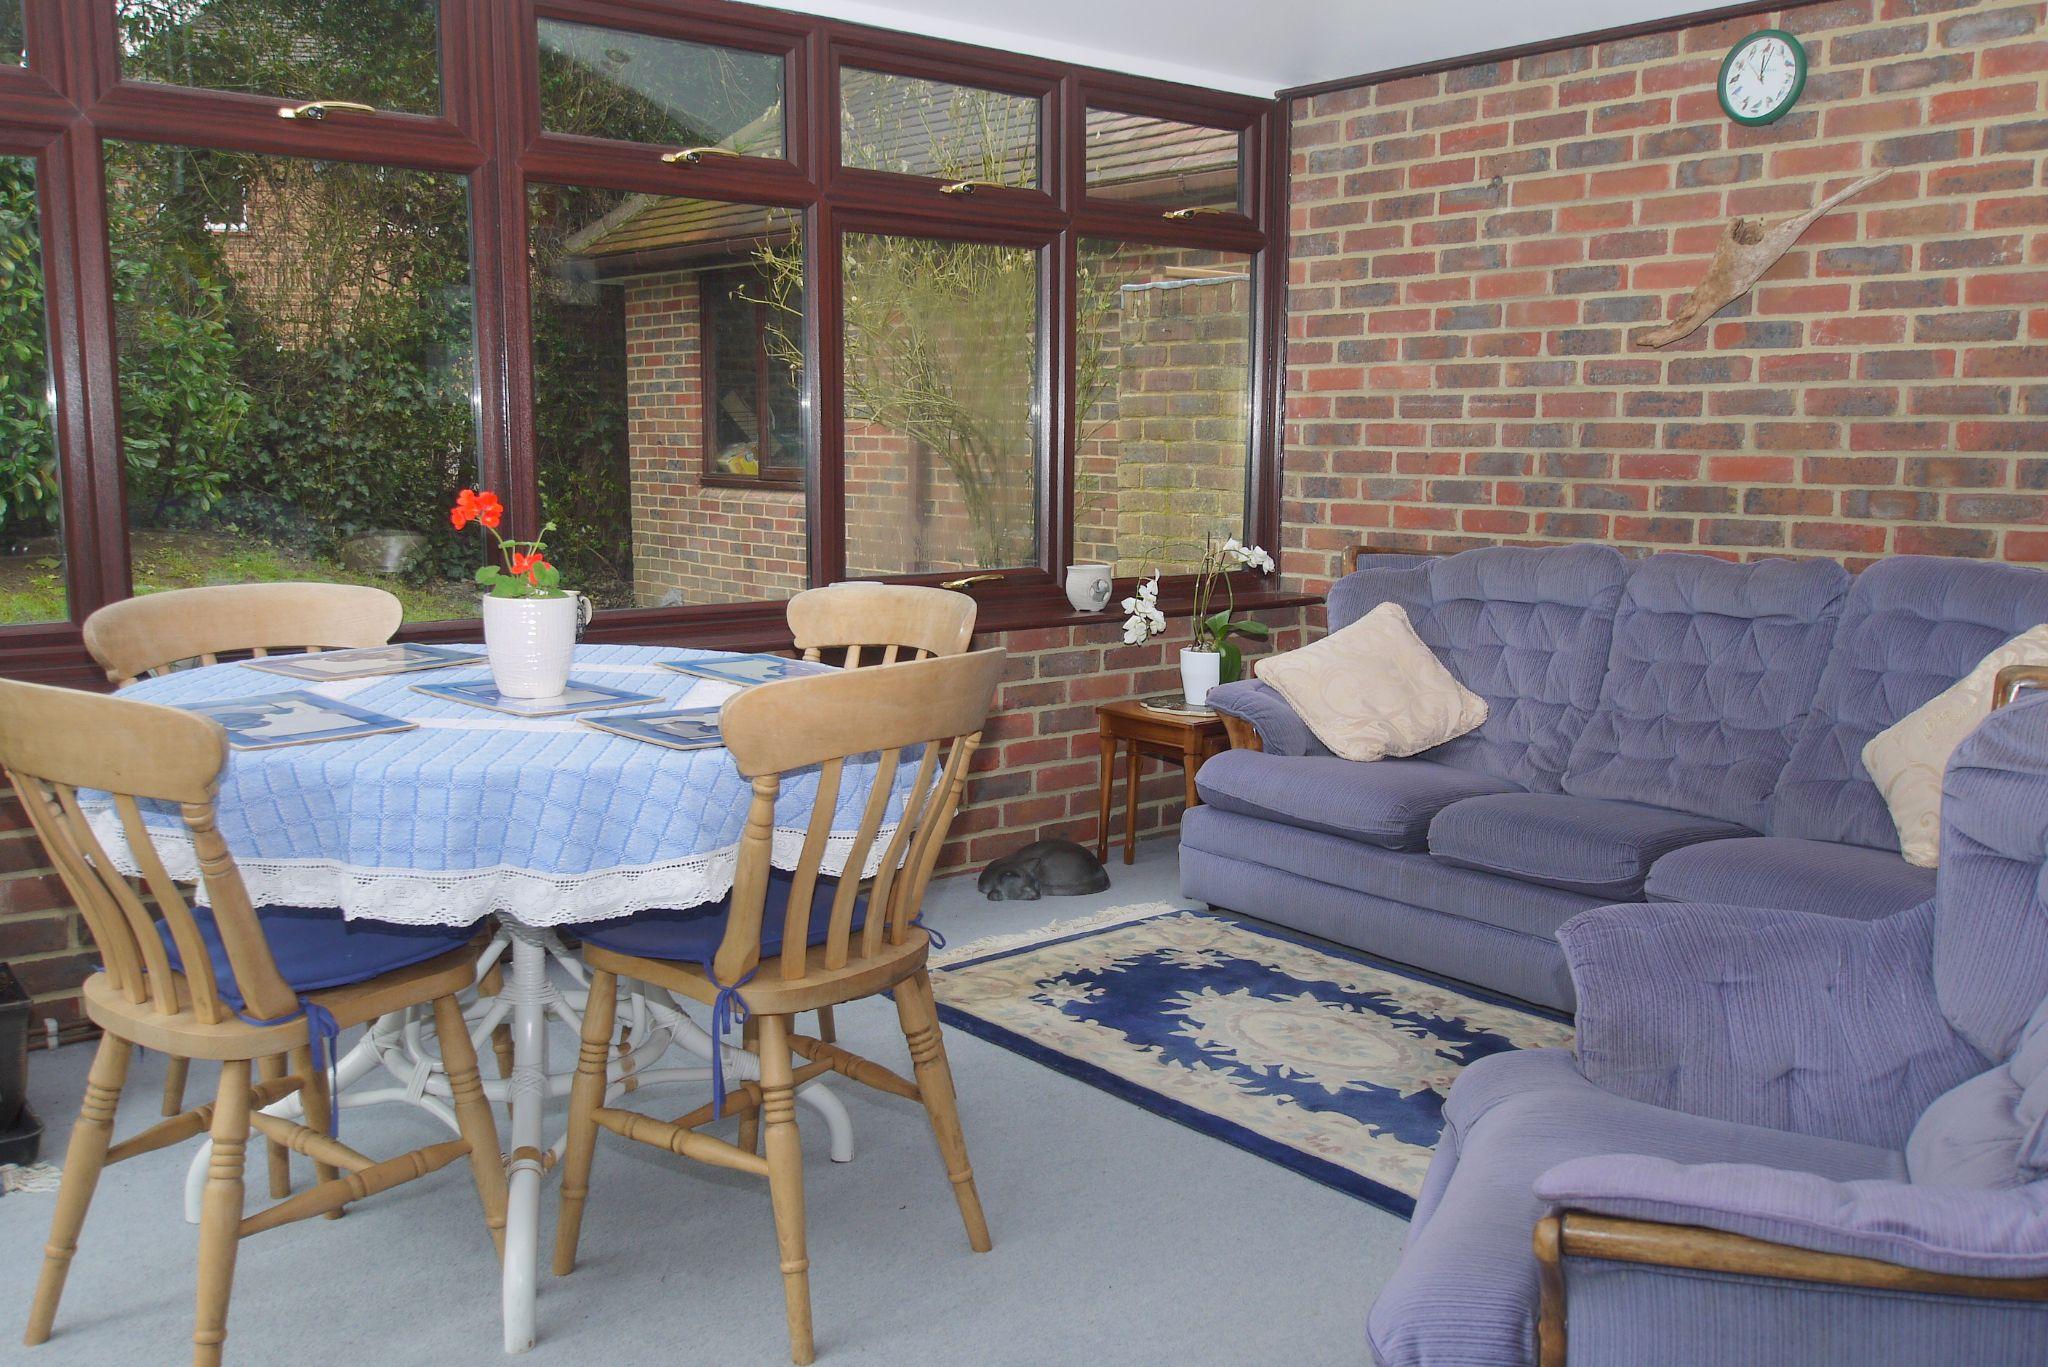 4 bedroom detached house Sold in Sevenoaks - Photograph 5